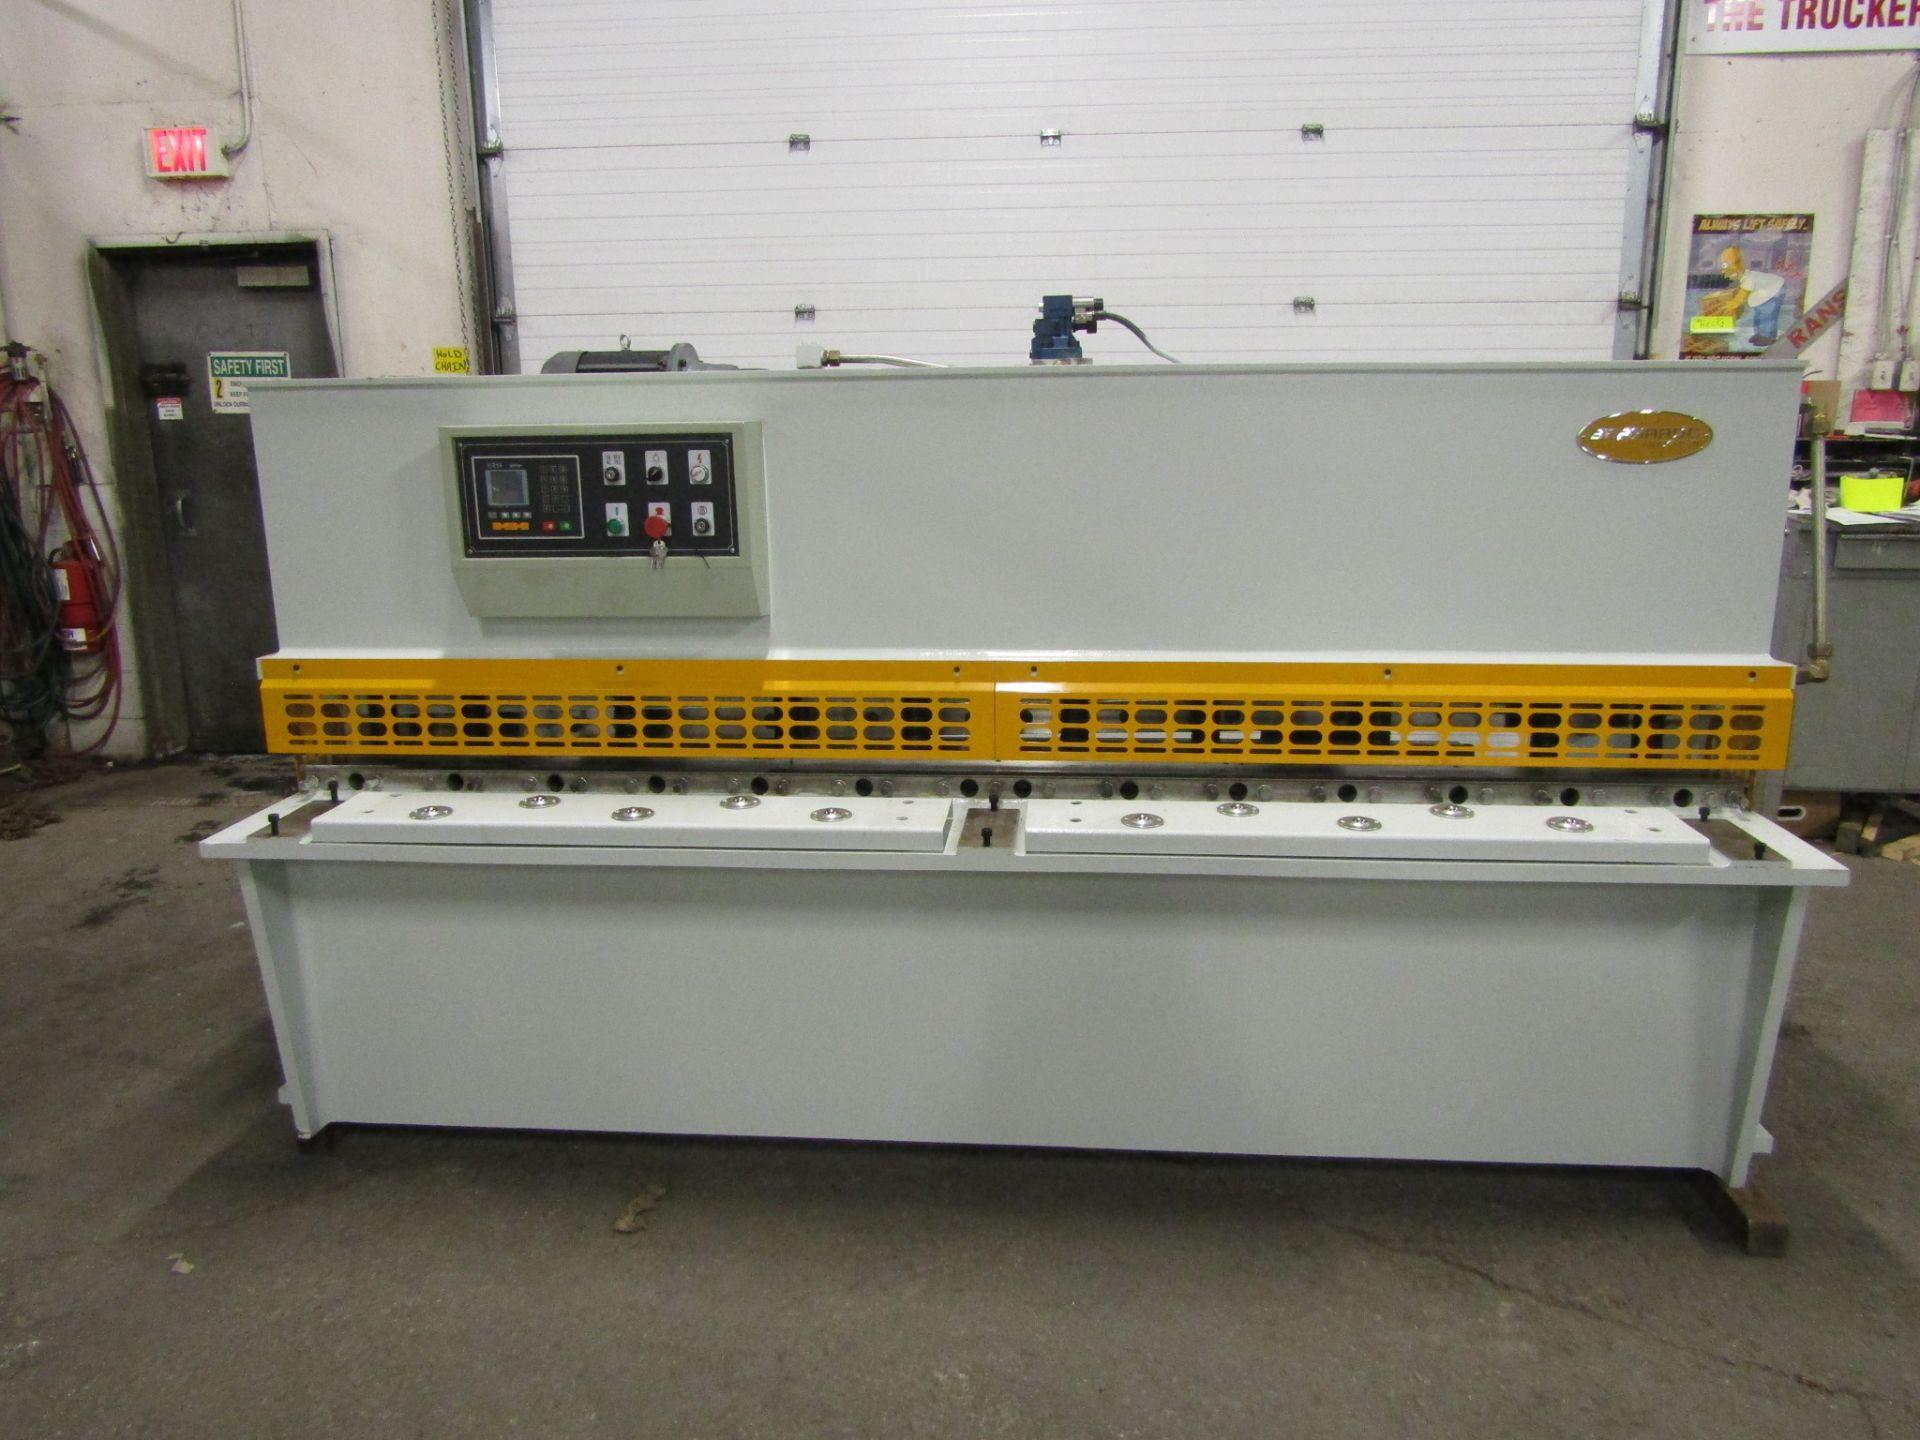 "Bernardo Hydraulic Shear 3/16"" max capacity 98"" width - 480/575V 3 phase MINT UNUSED UNIT complete - Image 6 of 6"